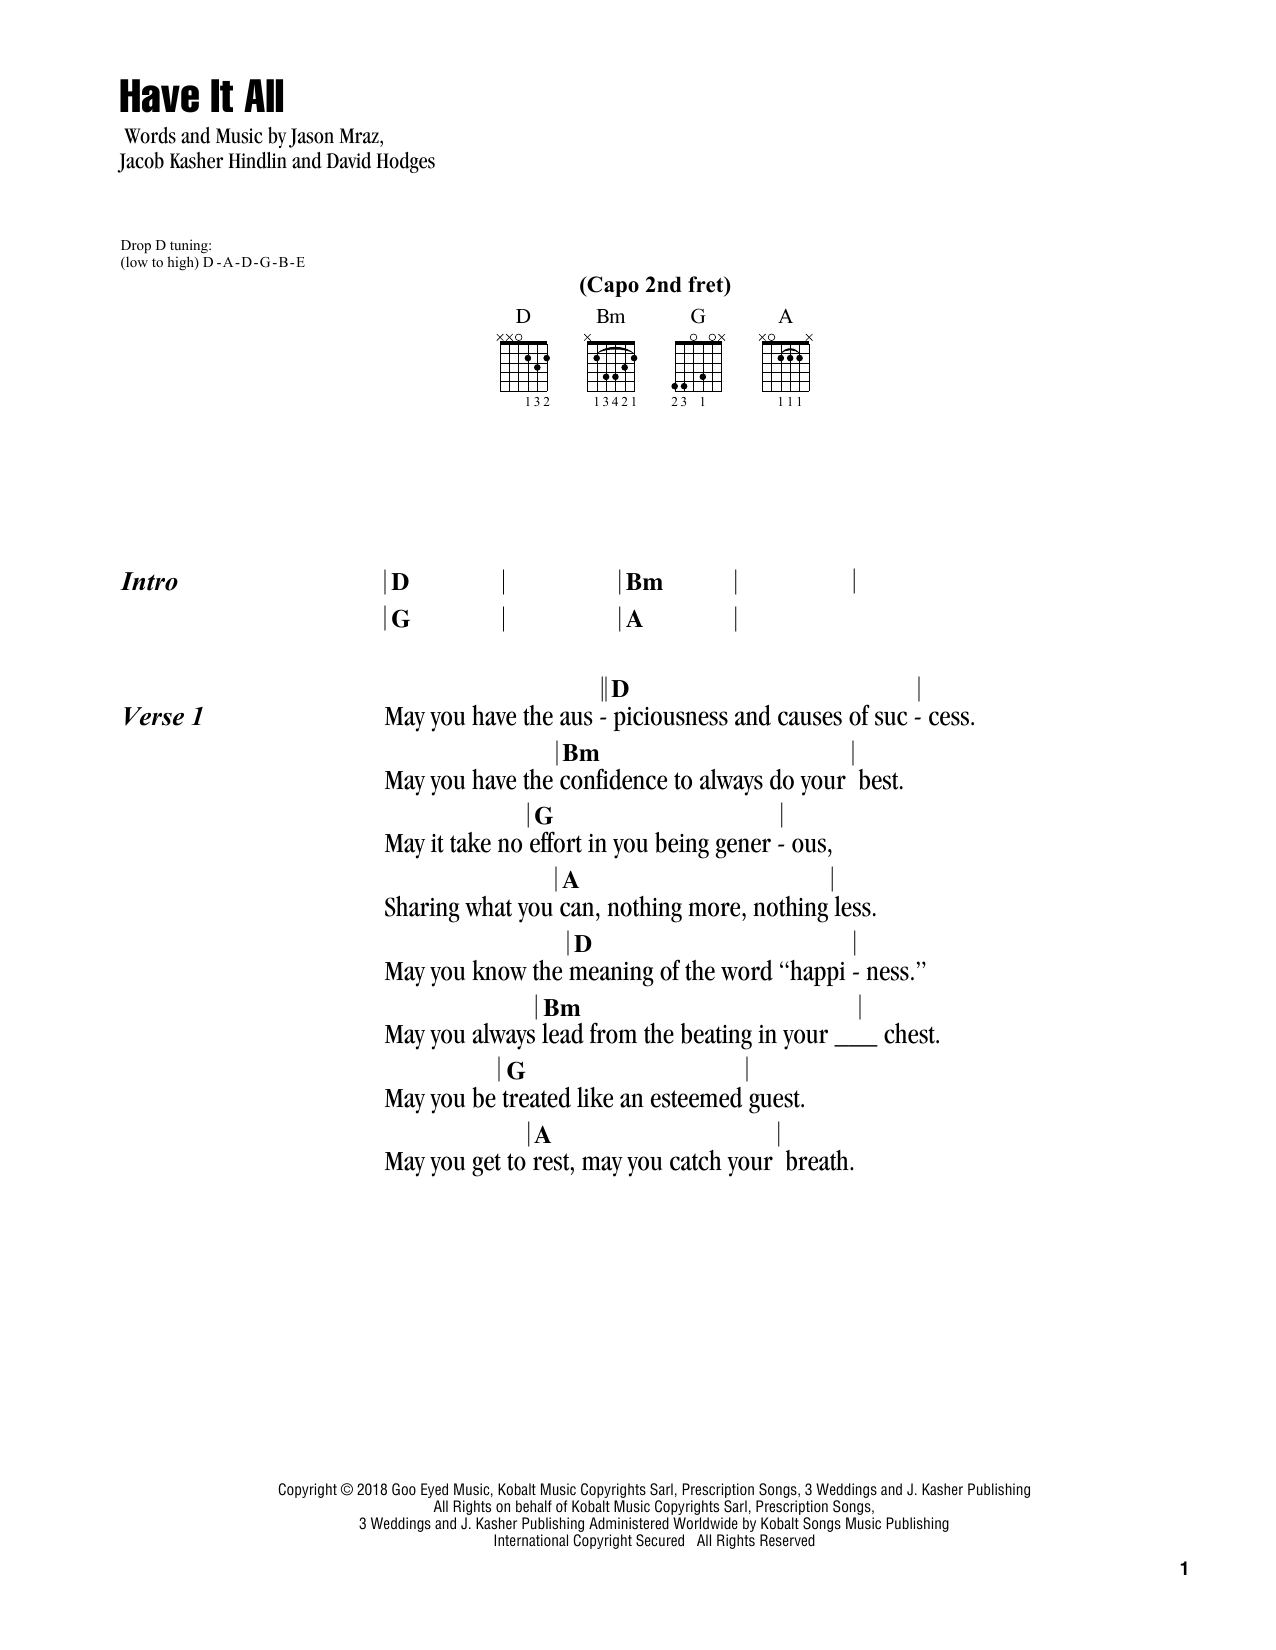 Sheet Music Digital Files To Print Licensed Jason Mraz Digital